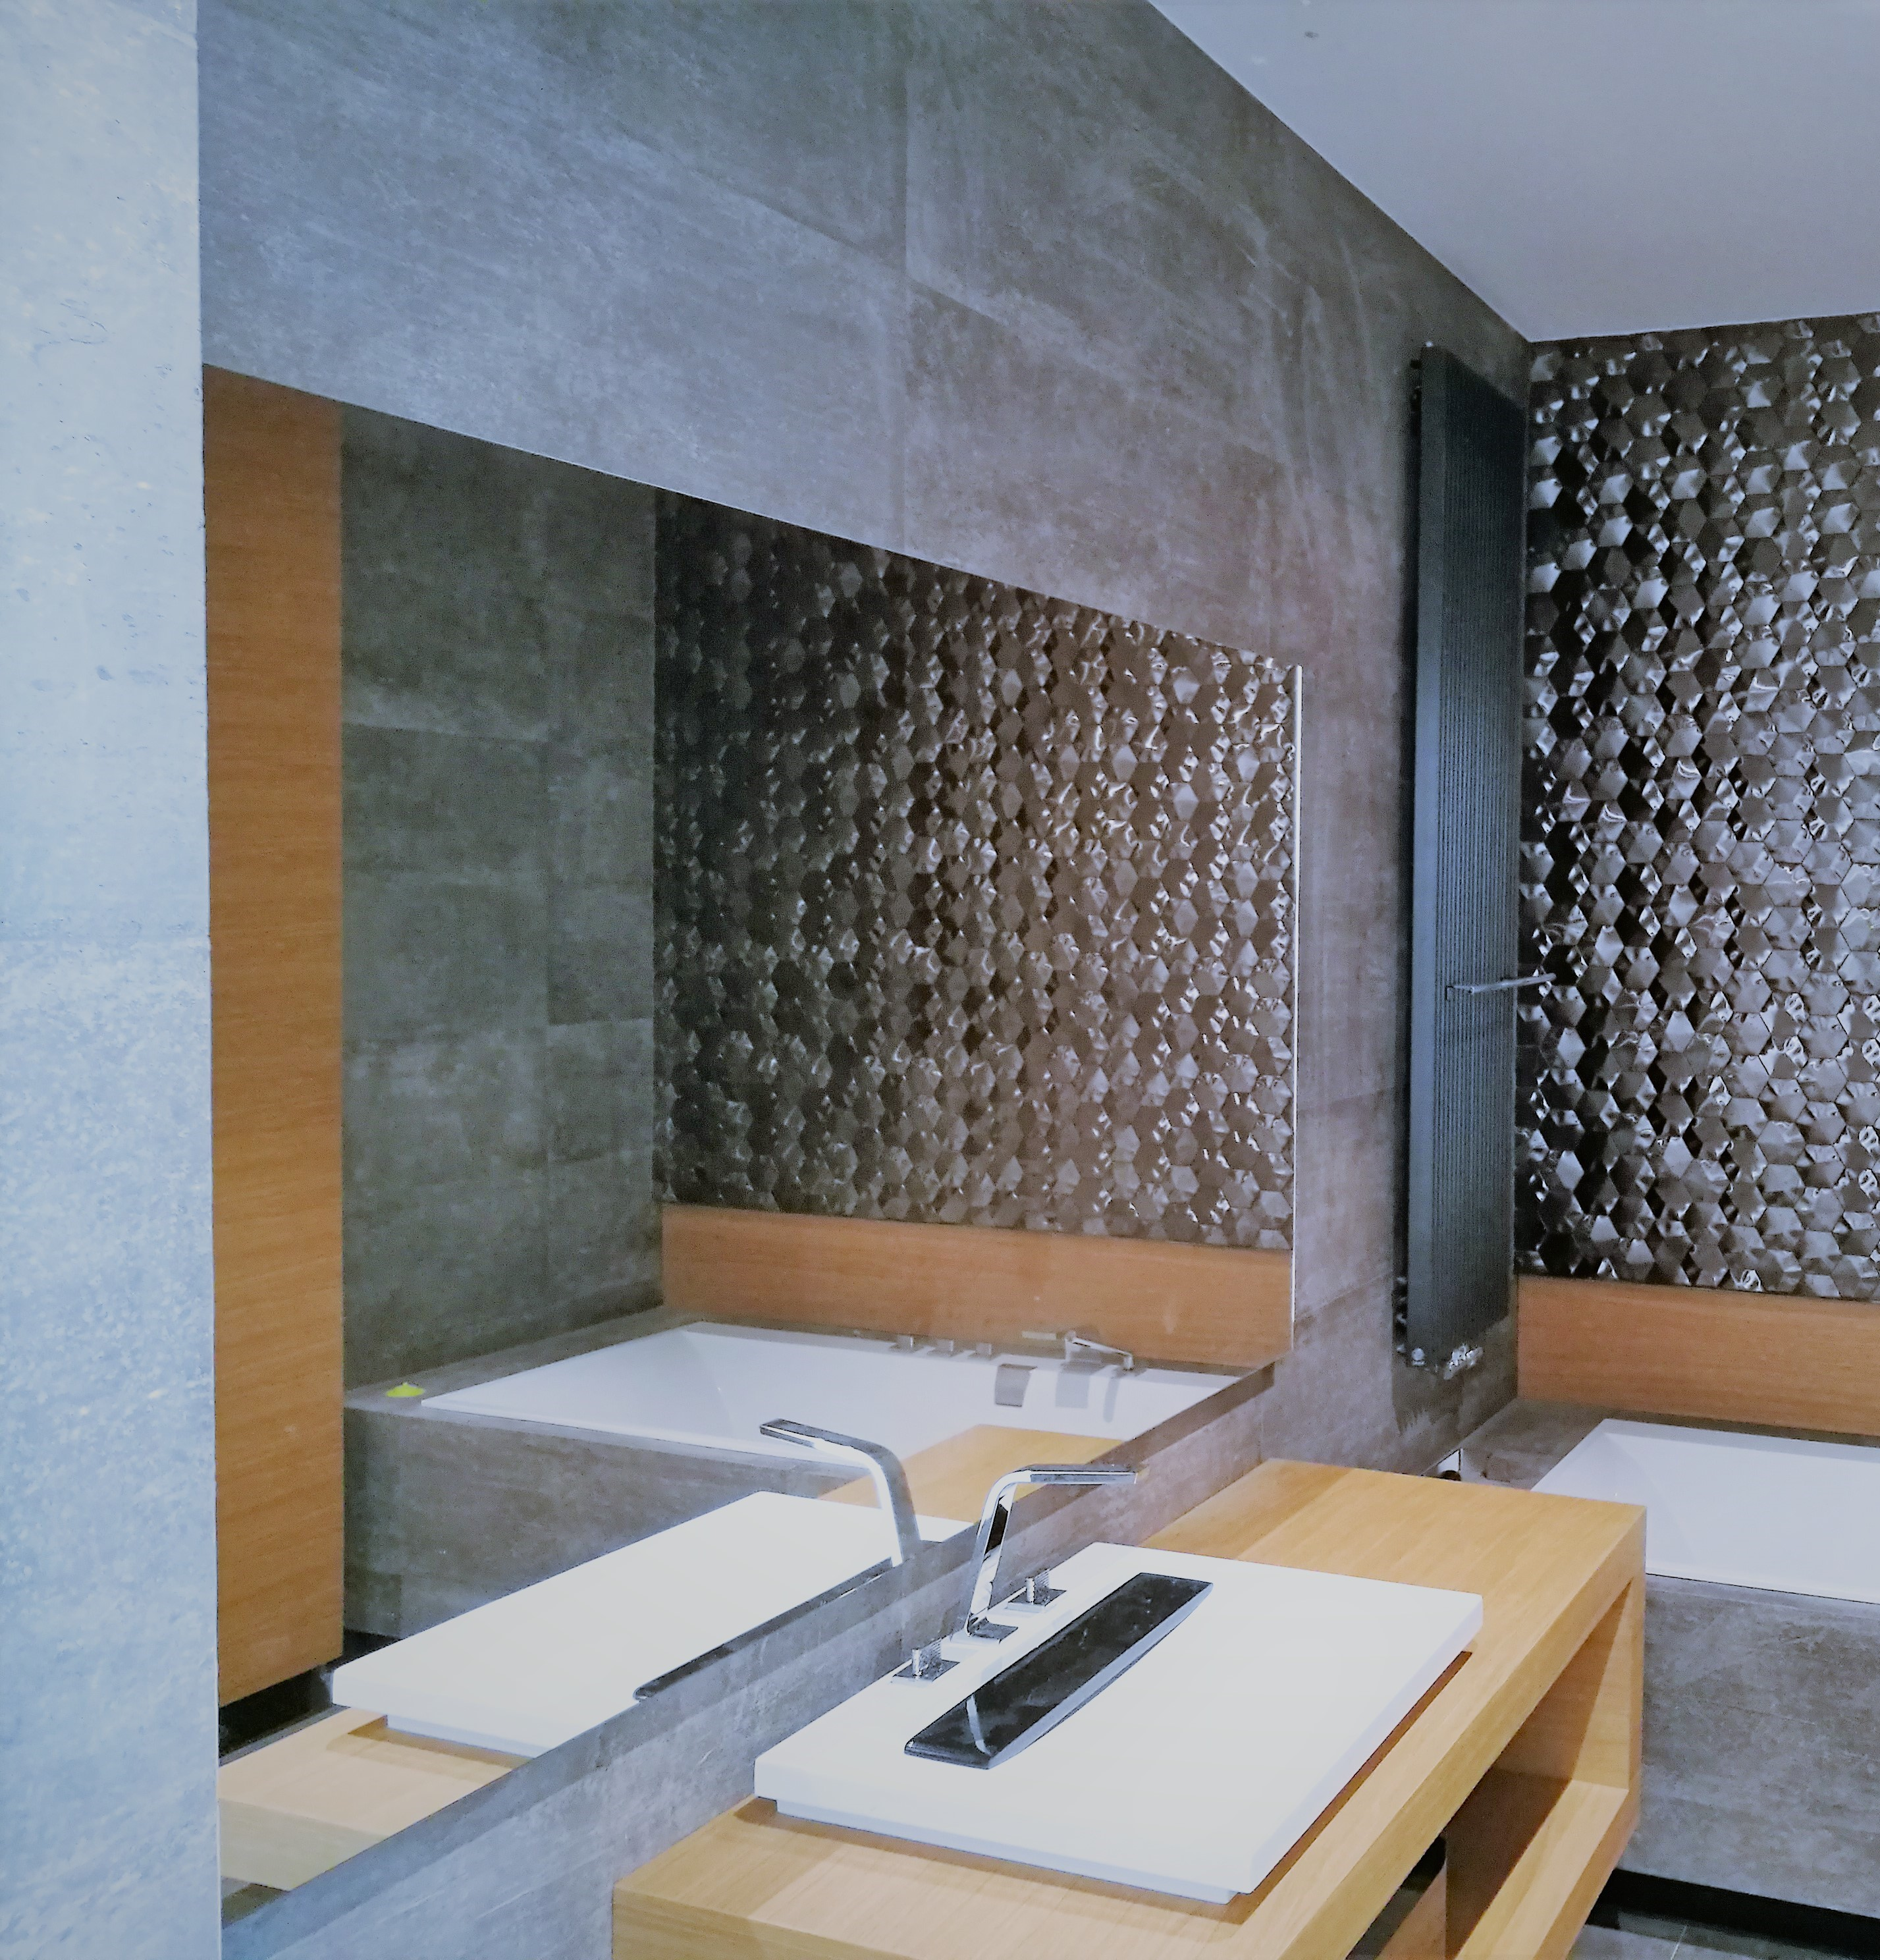 Lustro w łazience nad umywalkę